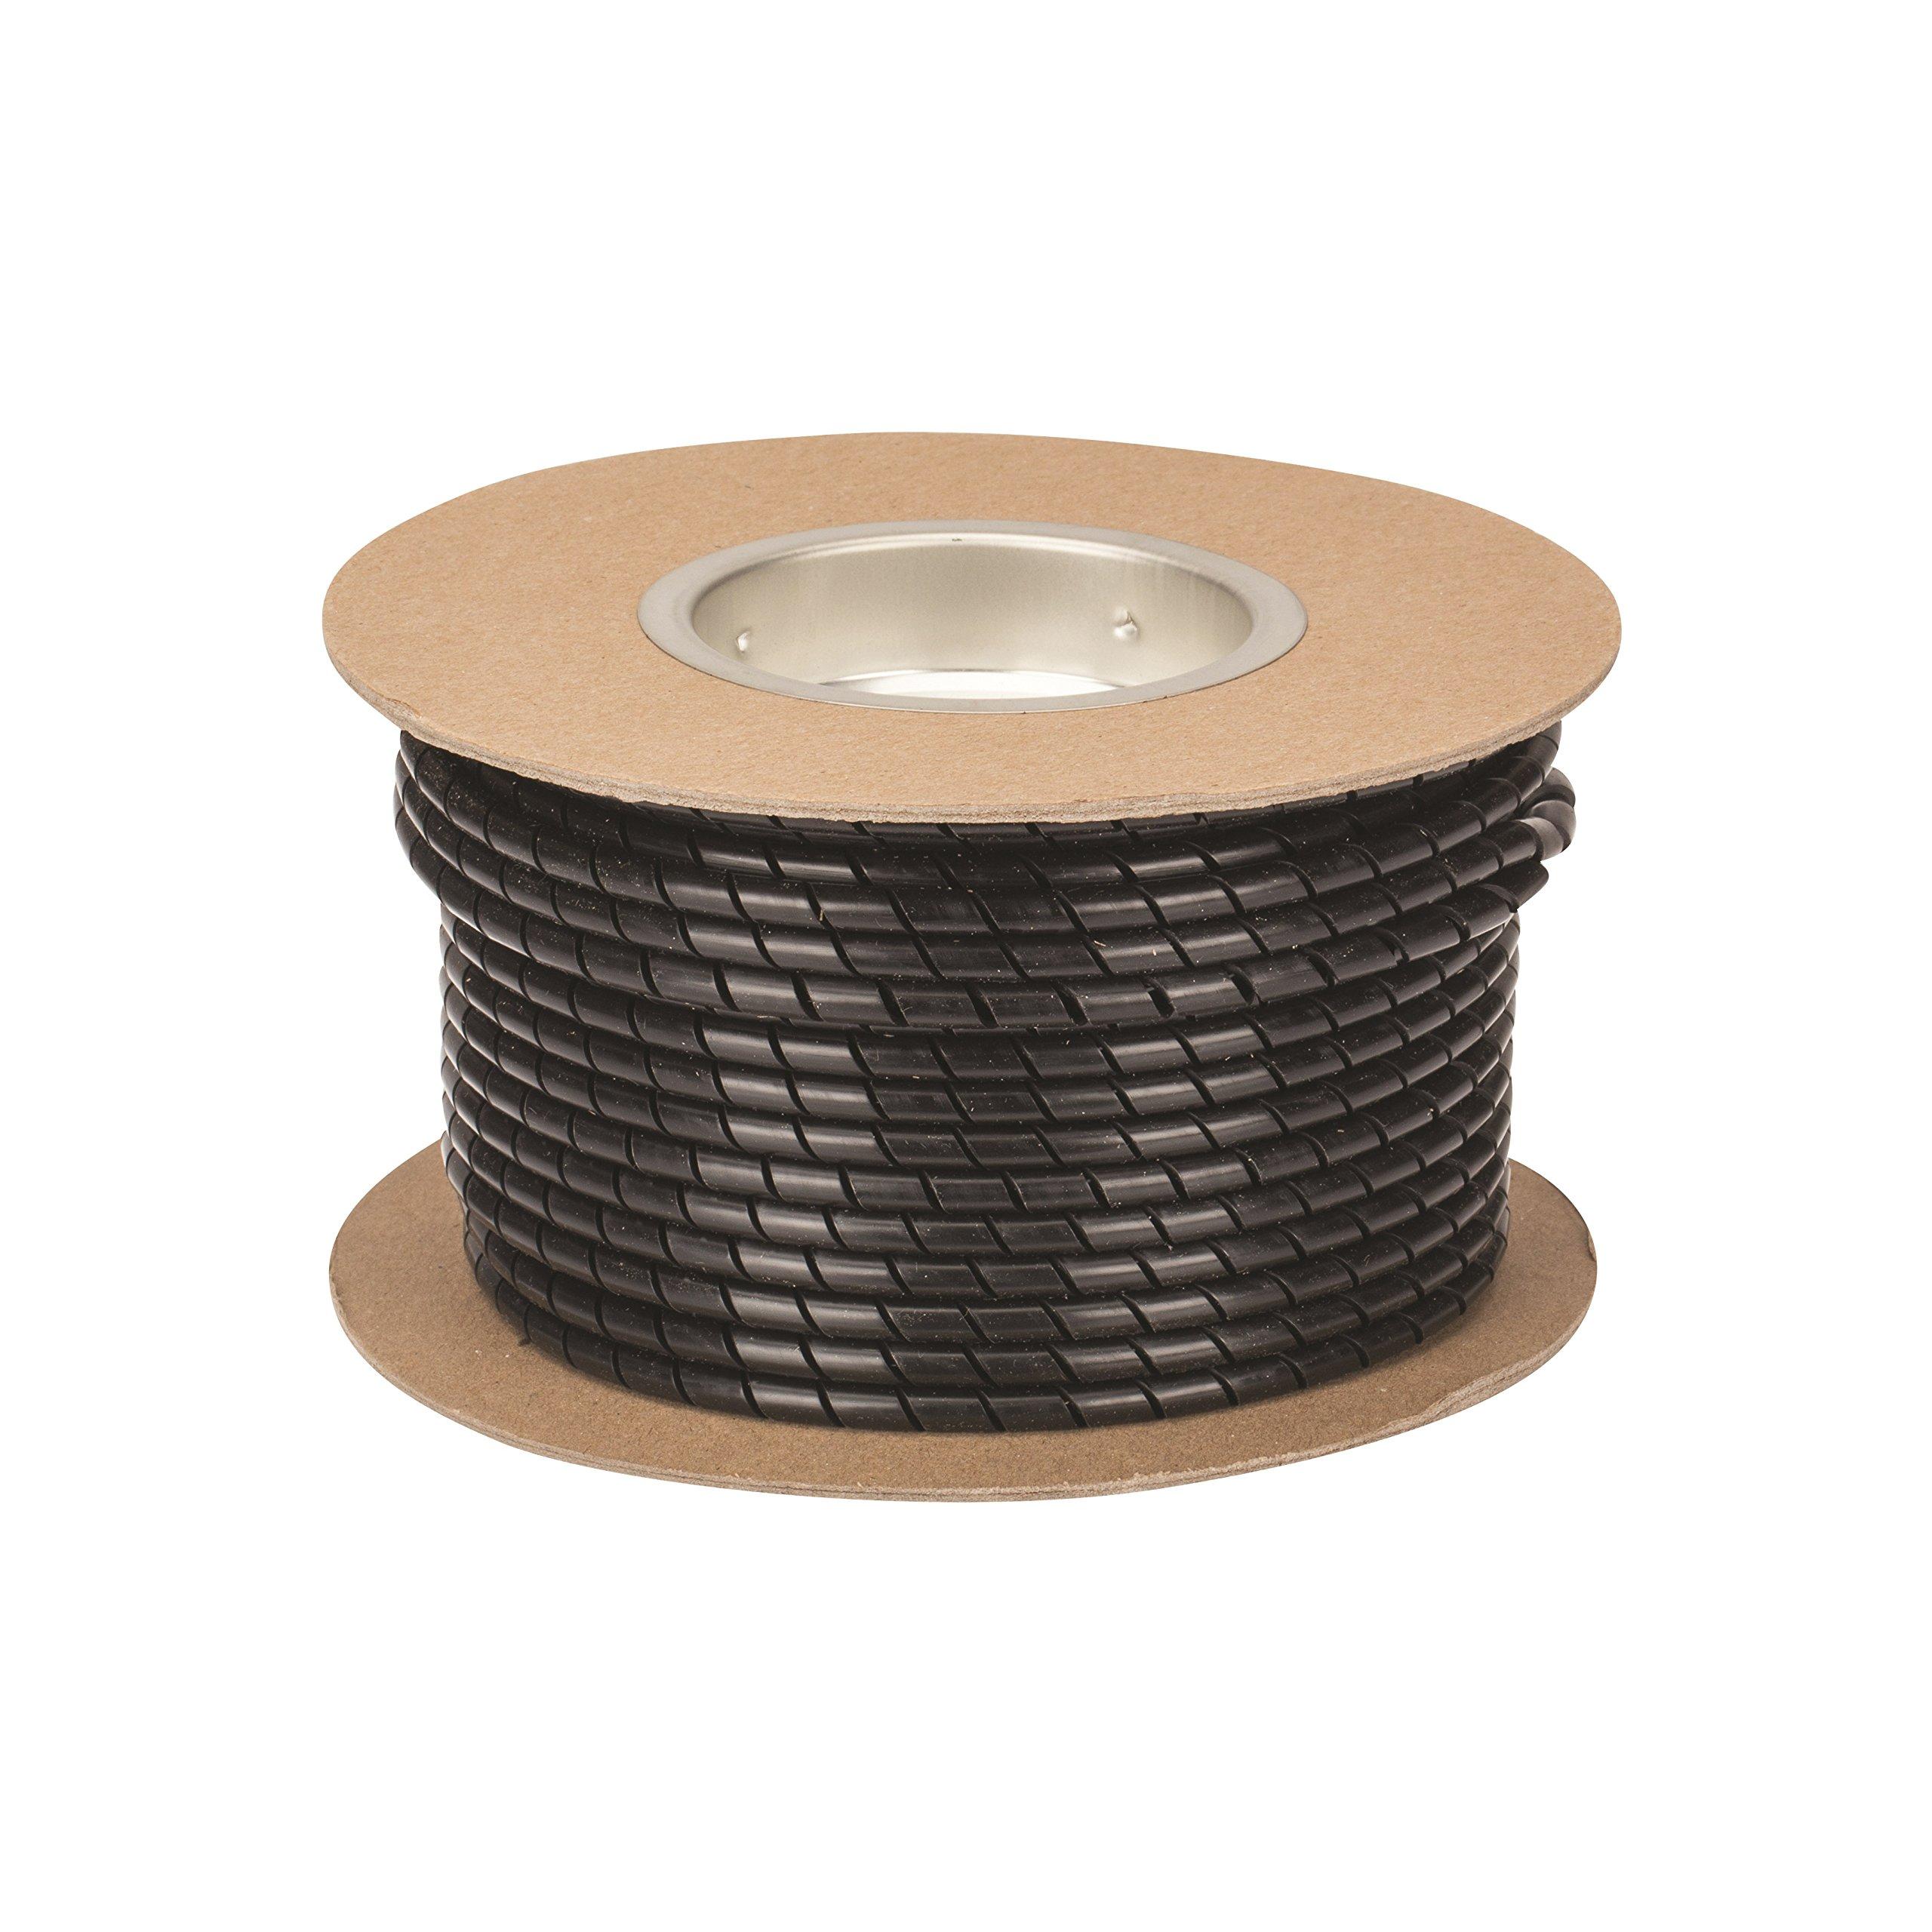 UV Polyethylene Spiral Wrap Cable Harness, 0.236'' OD x 0.157'' ID, 0.157'' - 1.97'' Bundle Range, Black by NSI (Image #2)